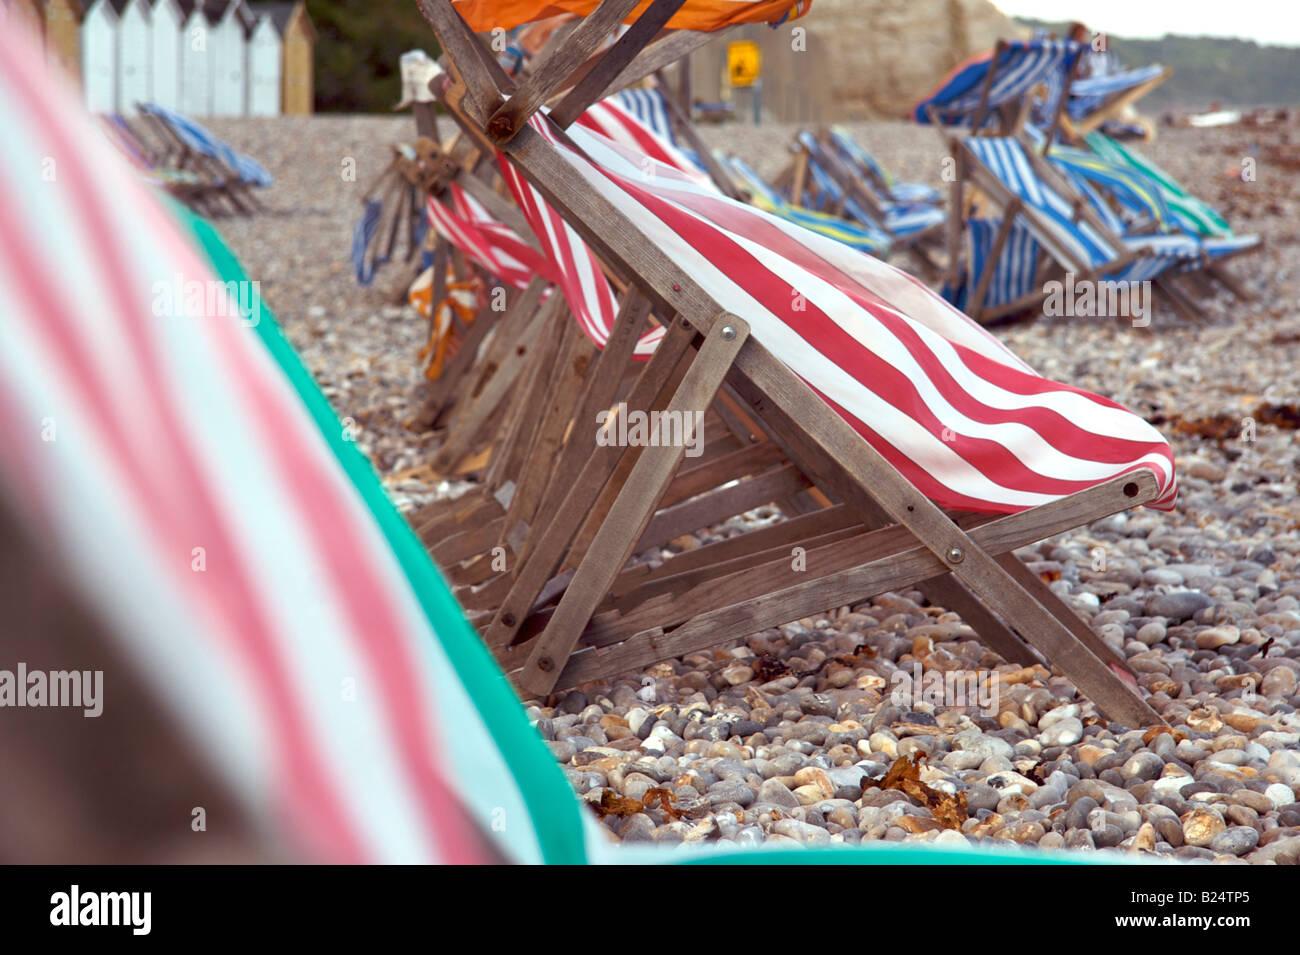 Liegestühle am Strand Stockbild